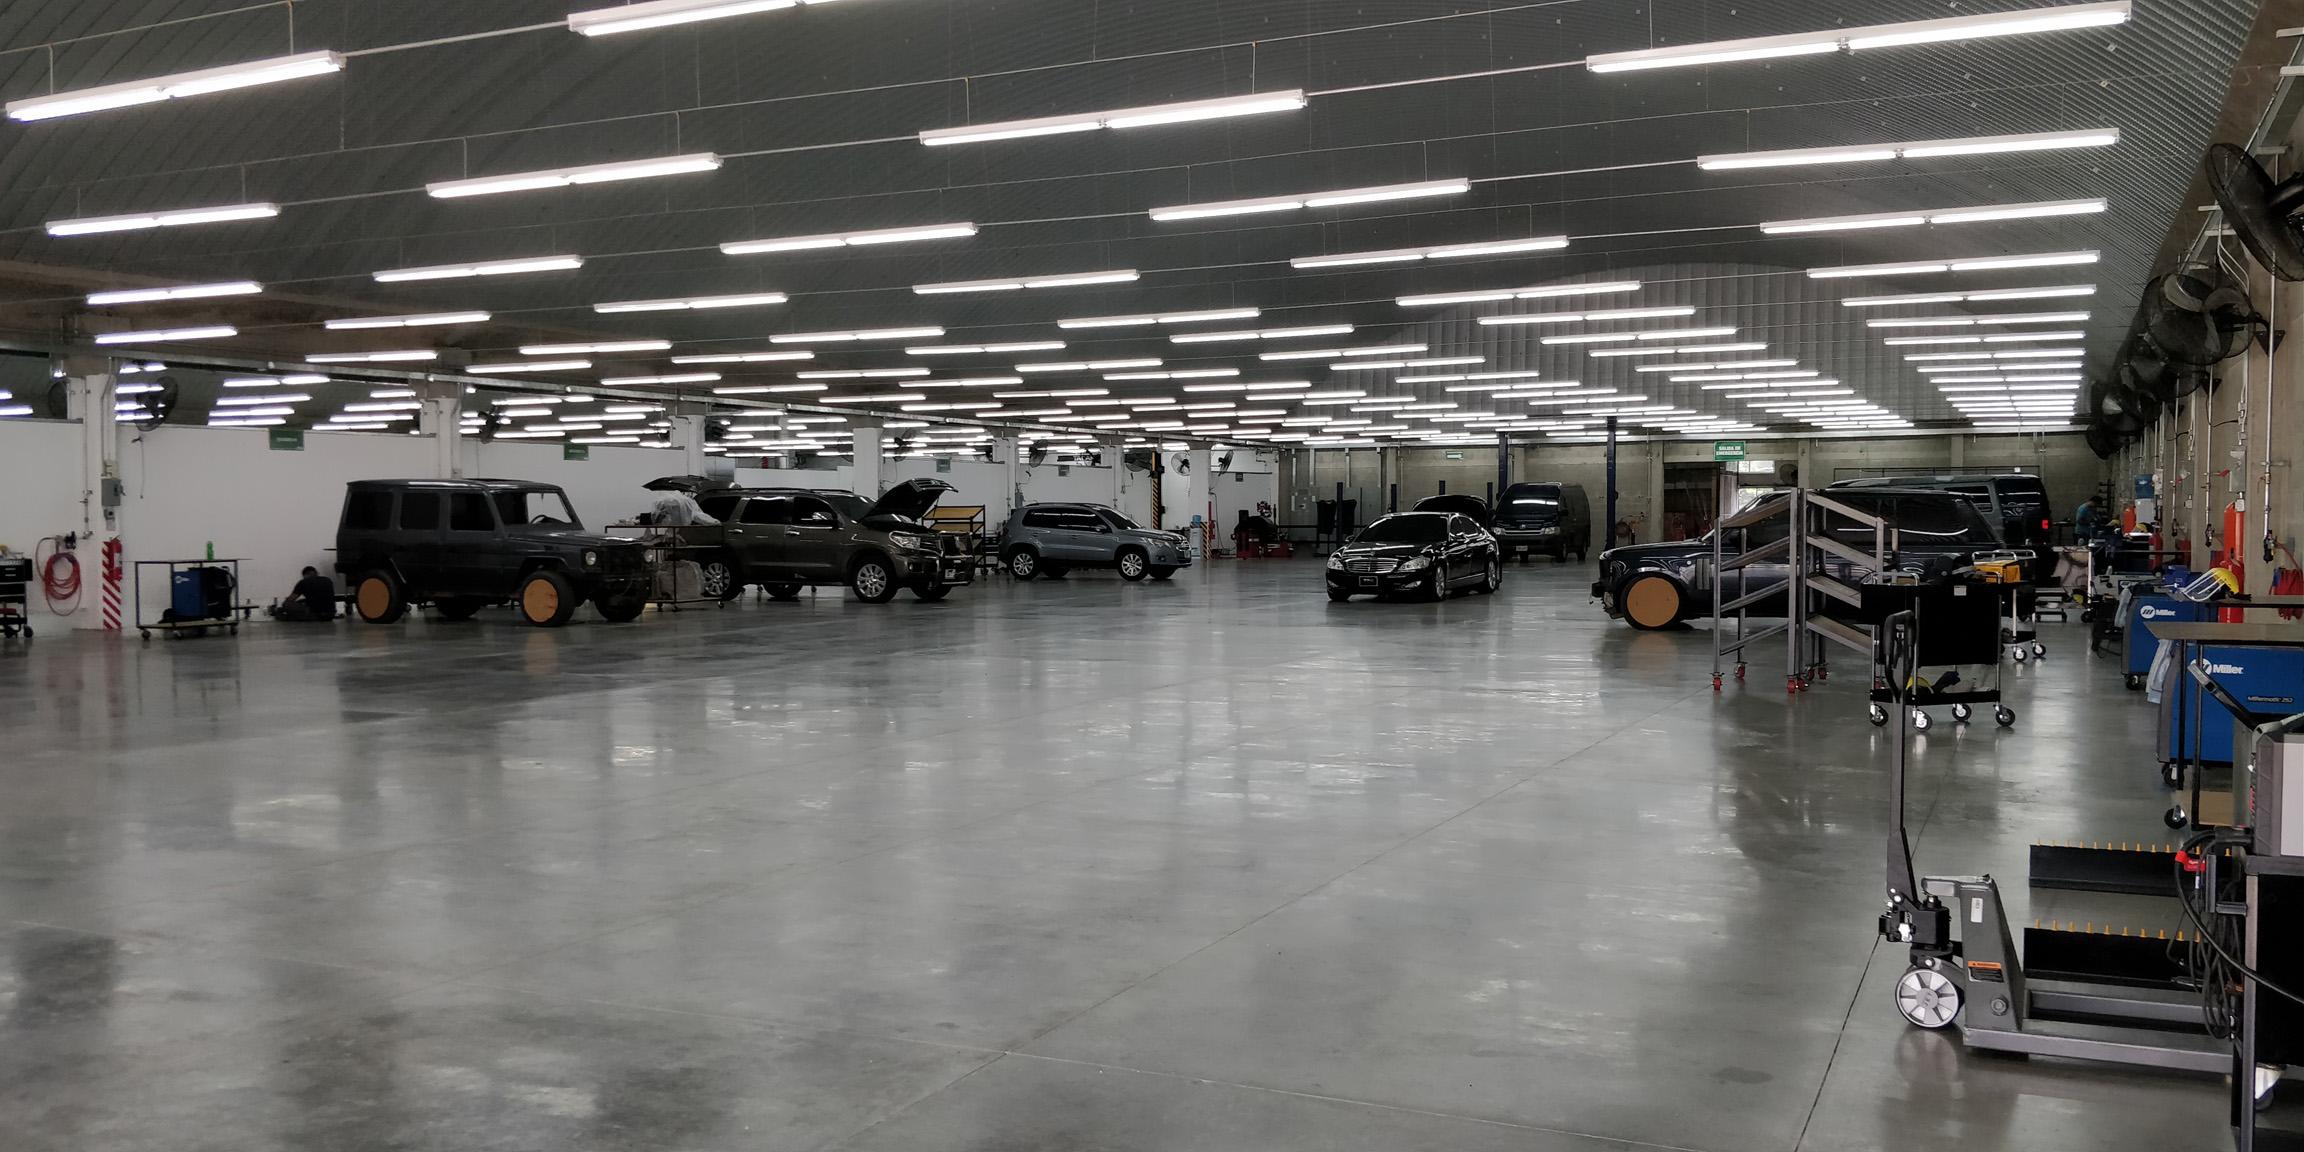 Armored Cars, Bulletproof Vehicles, Armoured Sedans & Trucks